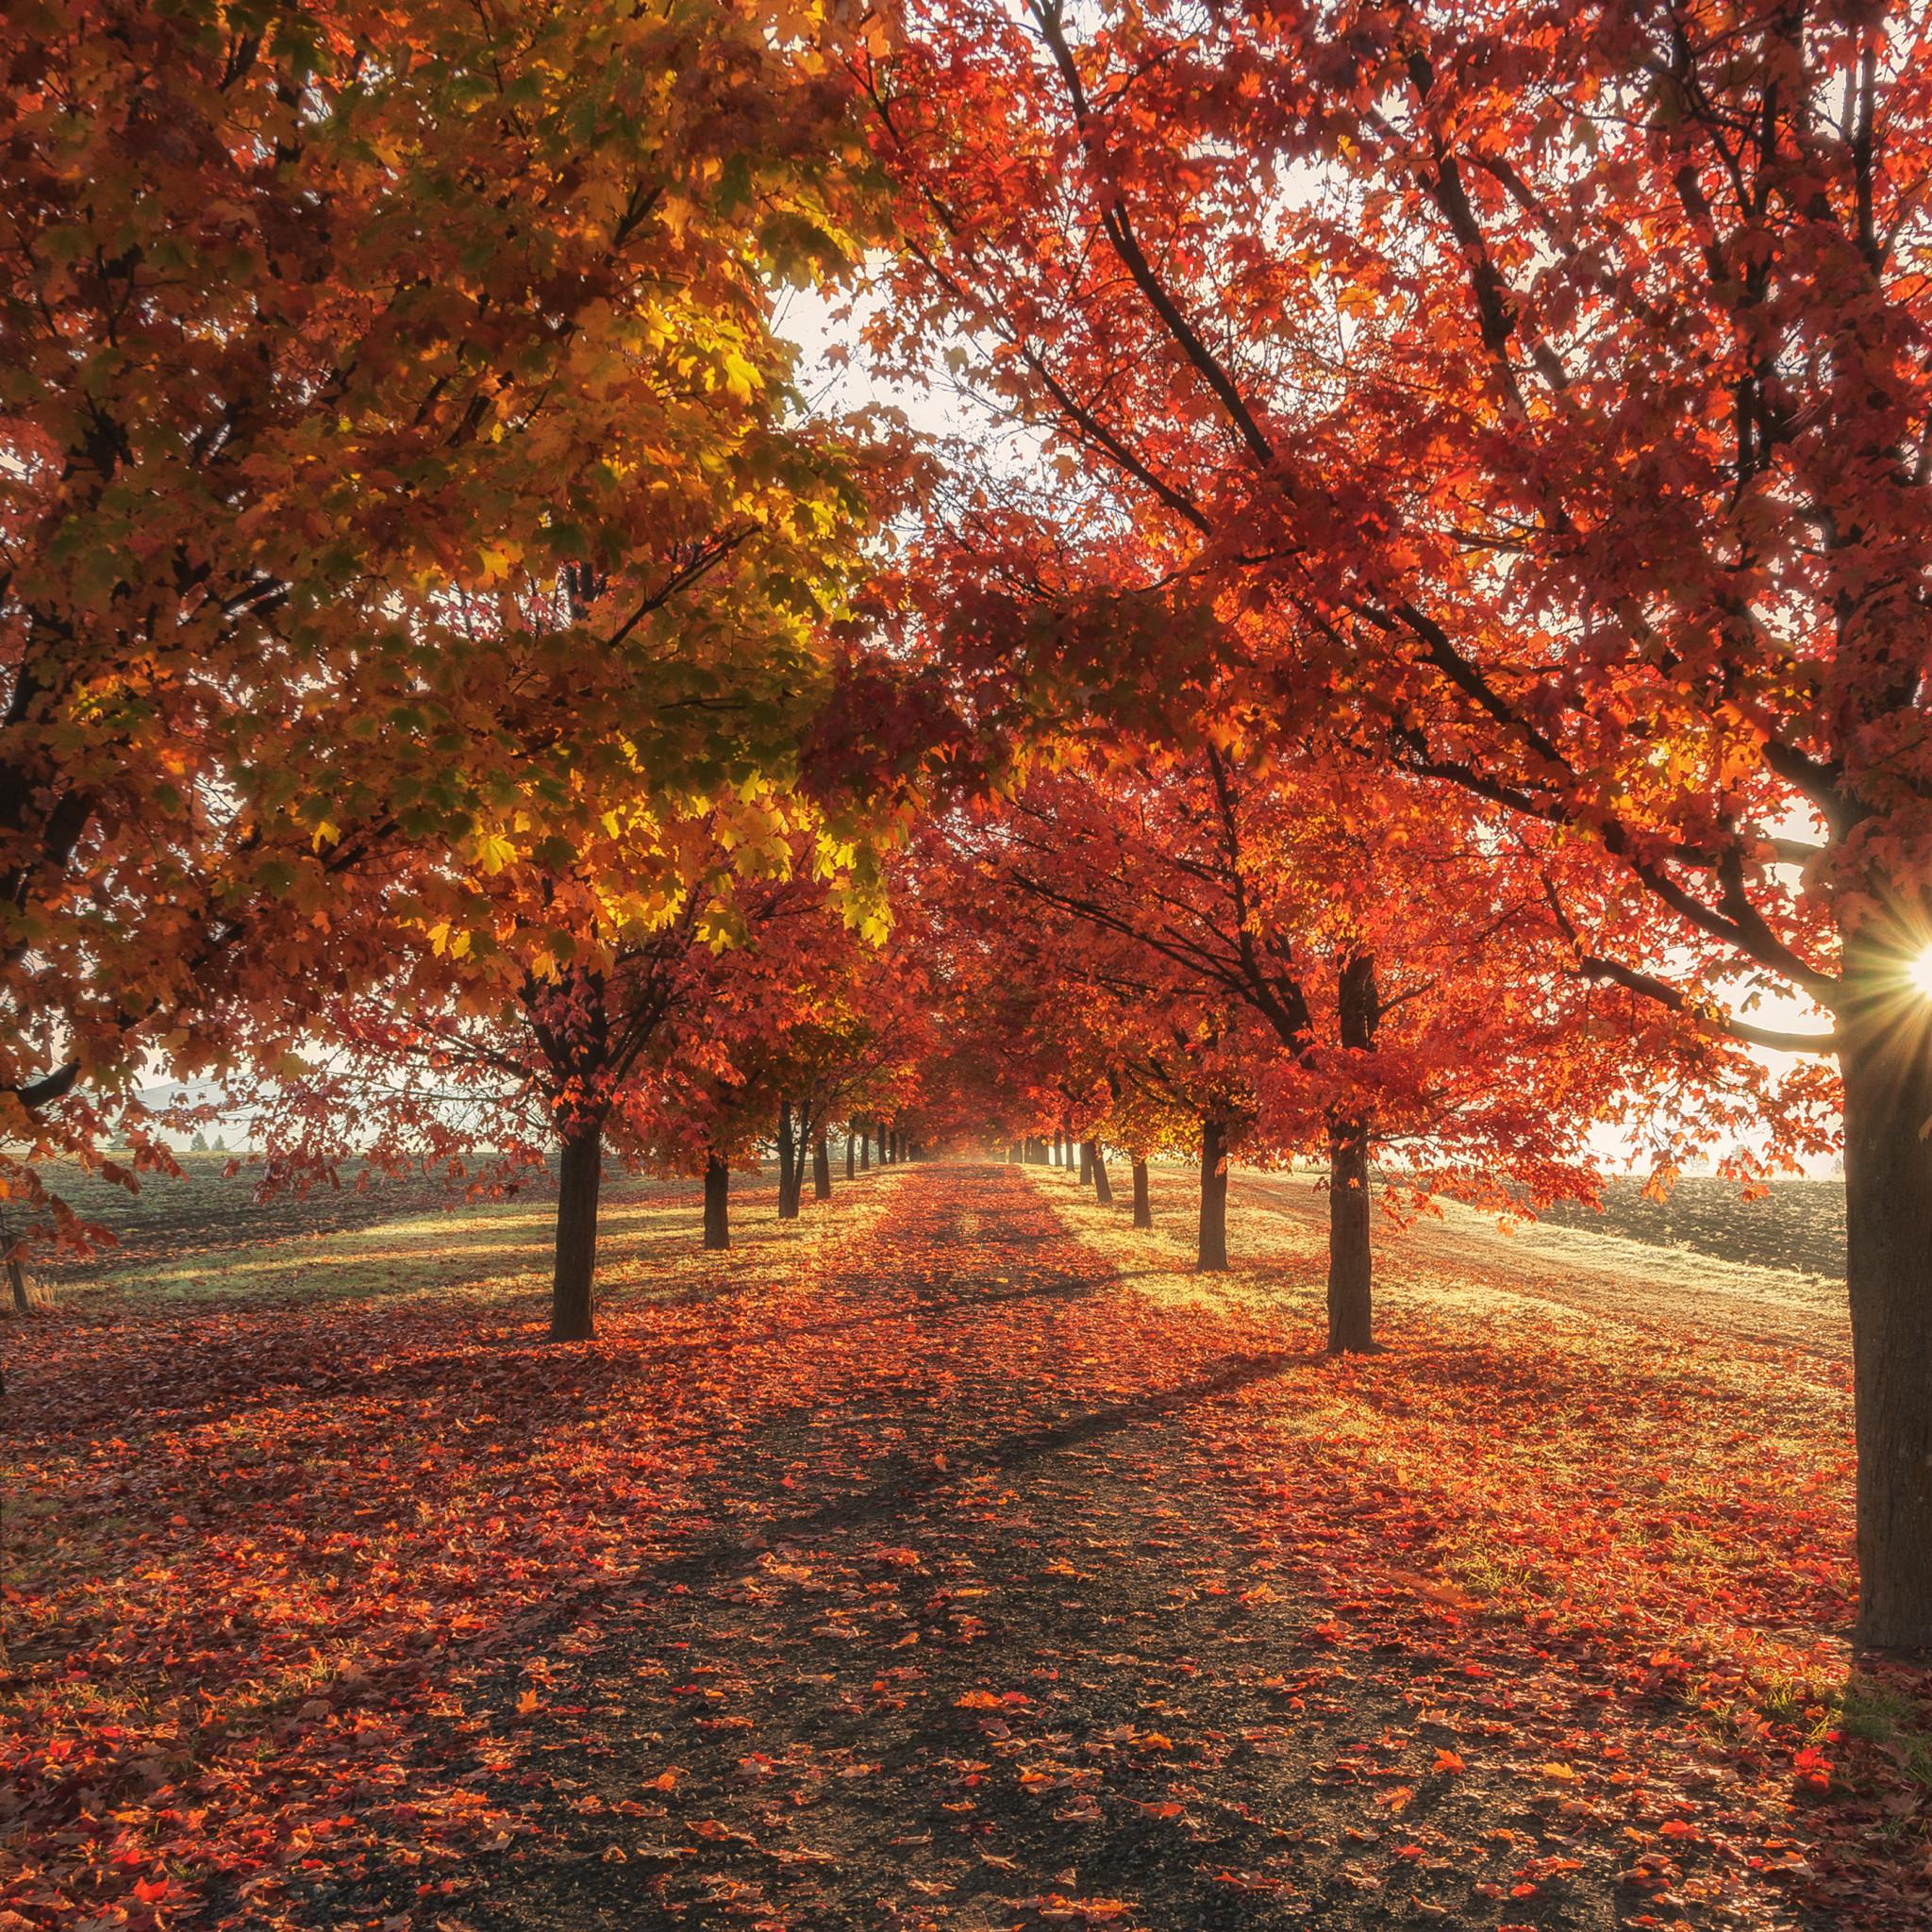 Autumn Iphone Wallpaper 4k 2048x2048 Wallpaper Teahub Io